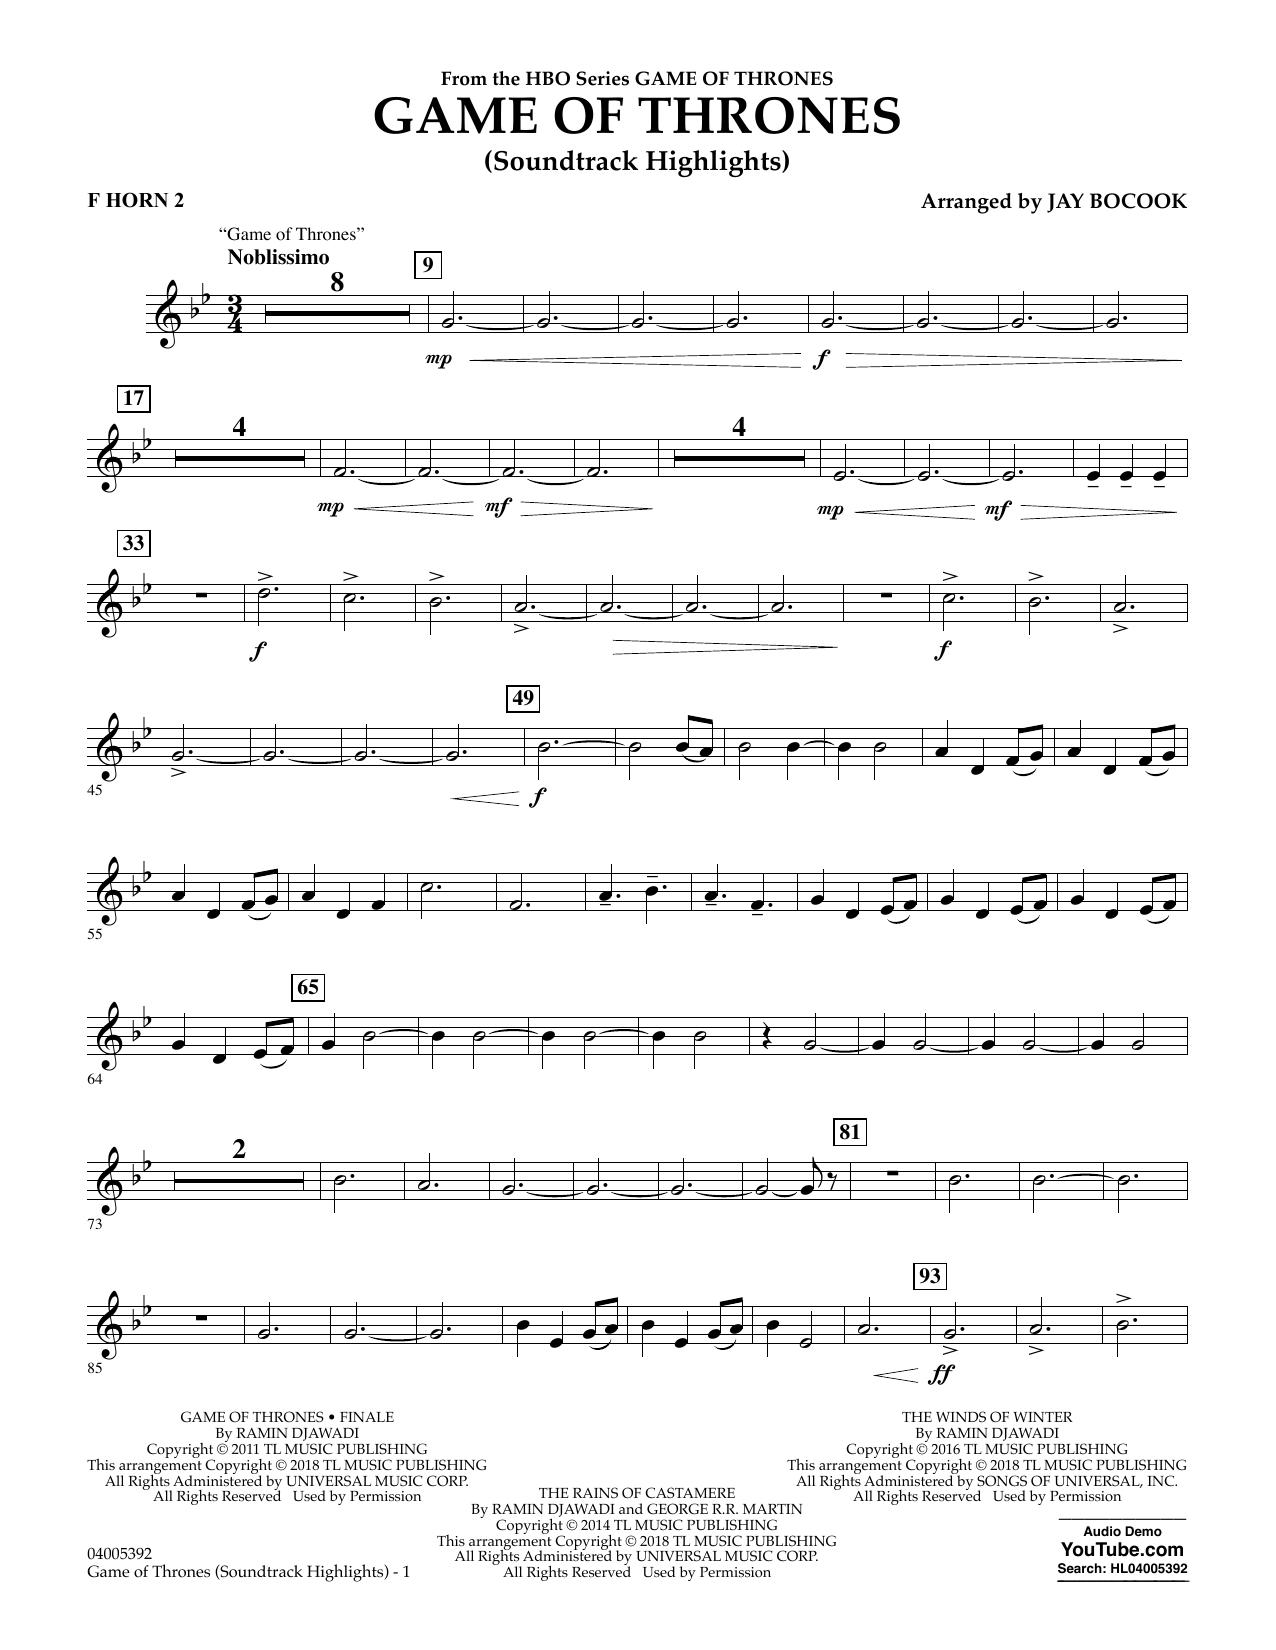 Game Of Thrones (Soundtrack Highlights) (arr. Jay Bocook) - F Horn 2 (Concert Band)